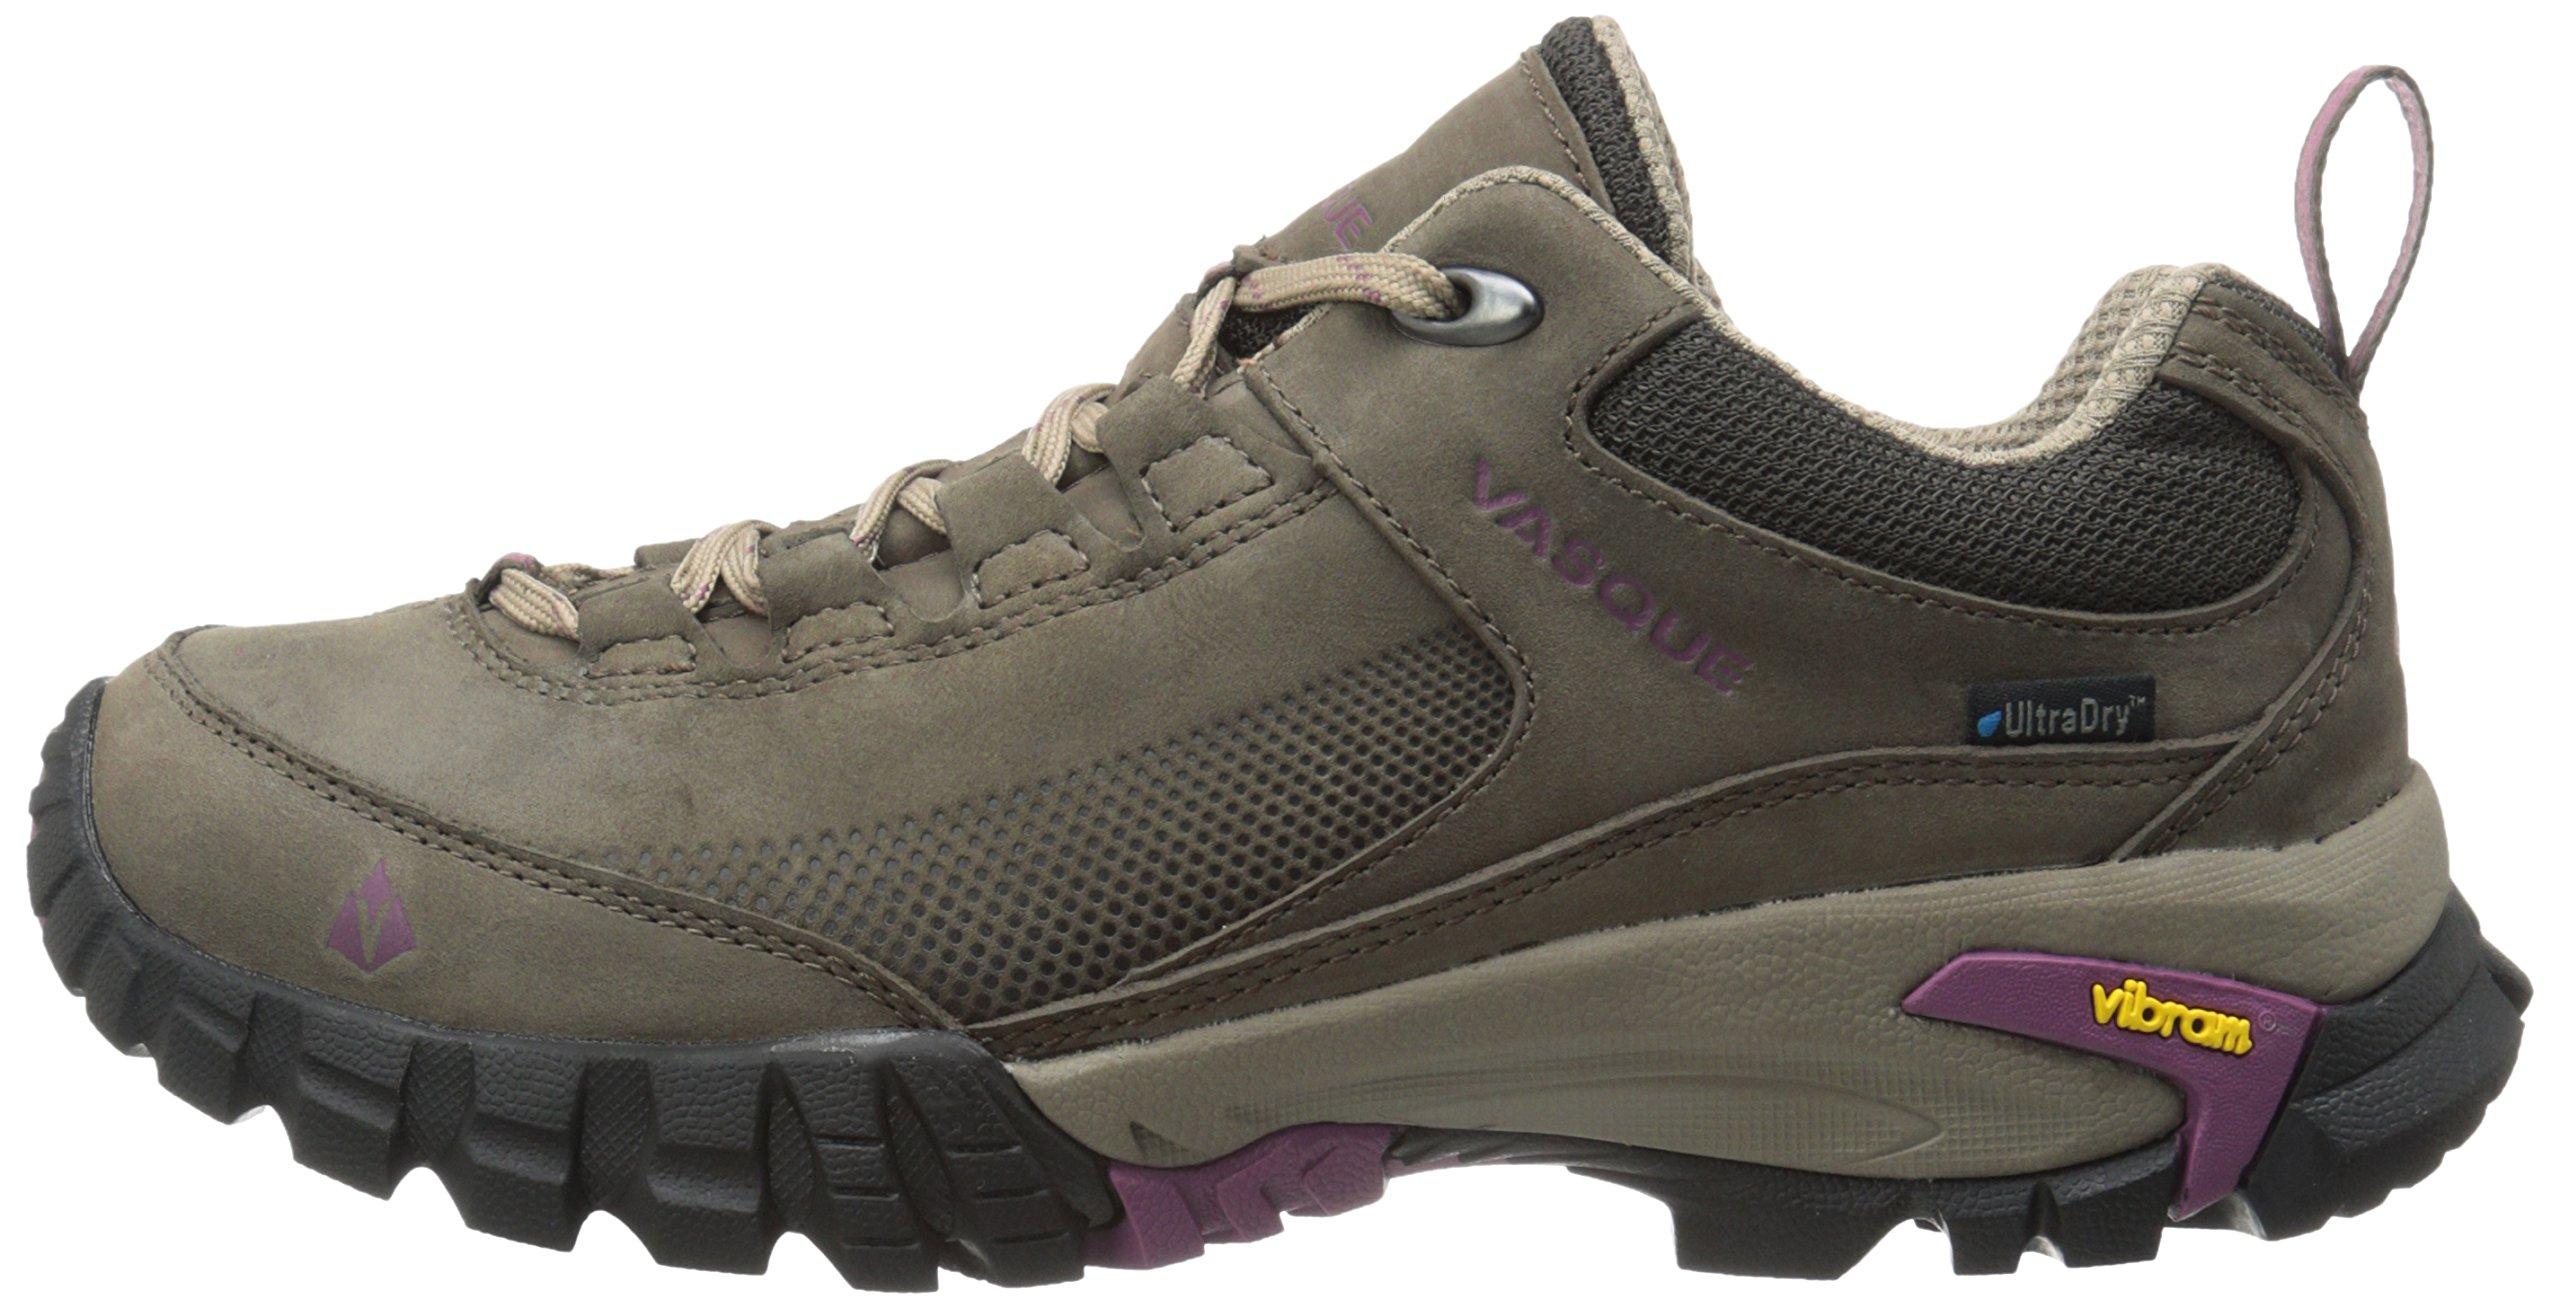 Vasque Women's Talus Trek Low UltraDry Hiking Shoe, Black Olive/Damson, 8.5 M US by Vasque (Image #5)